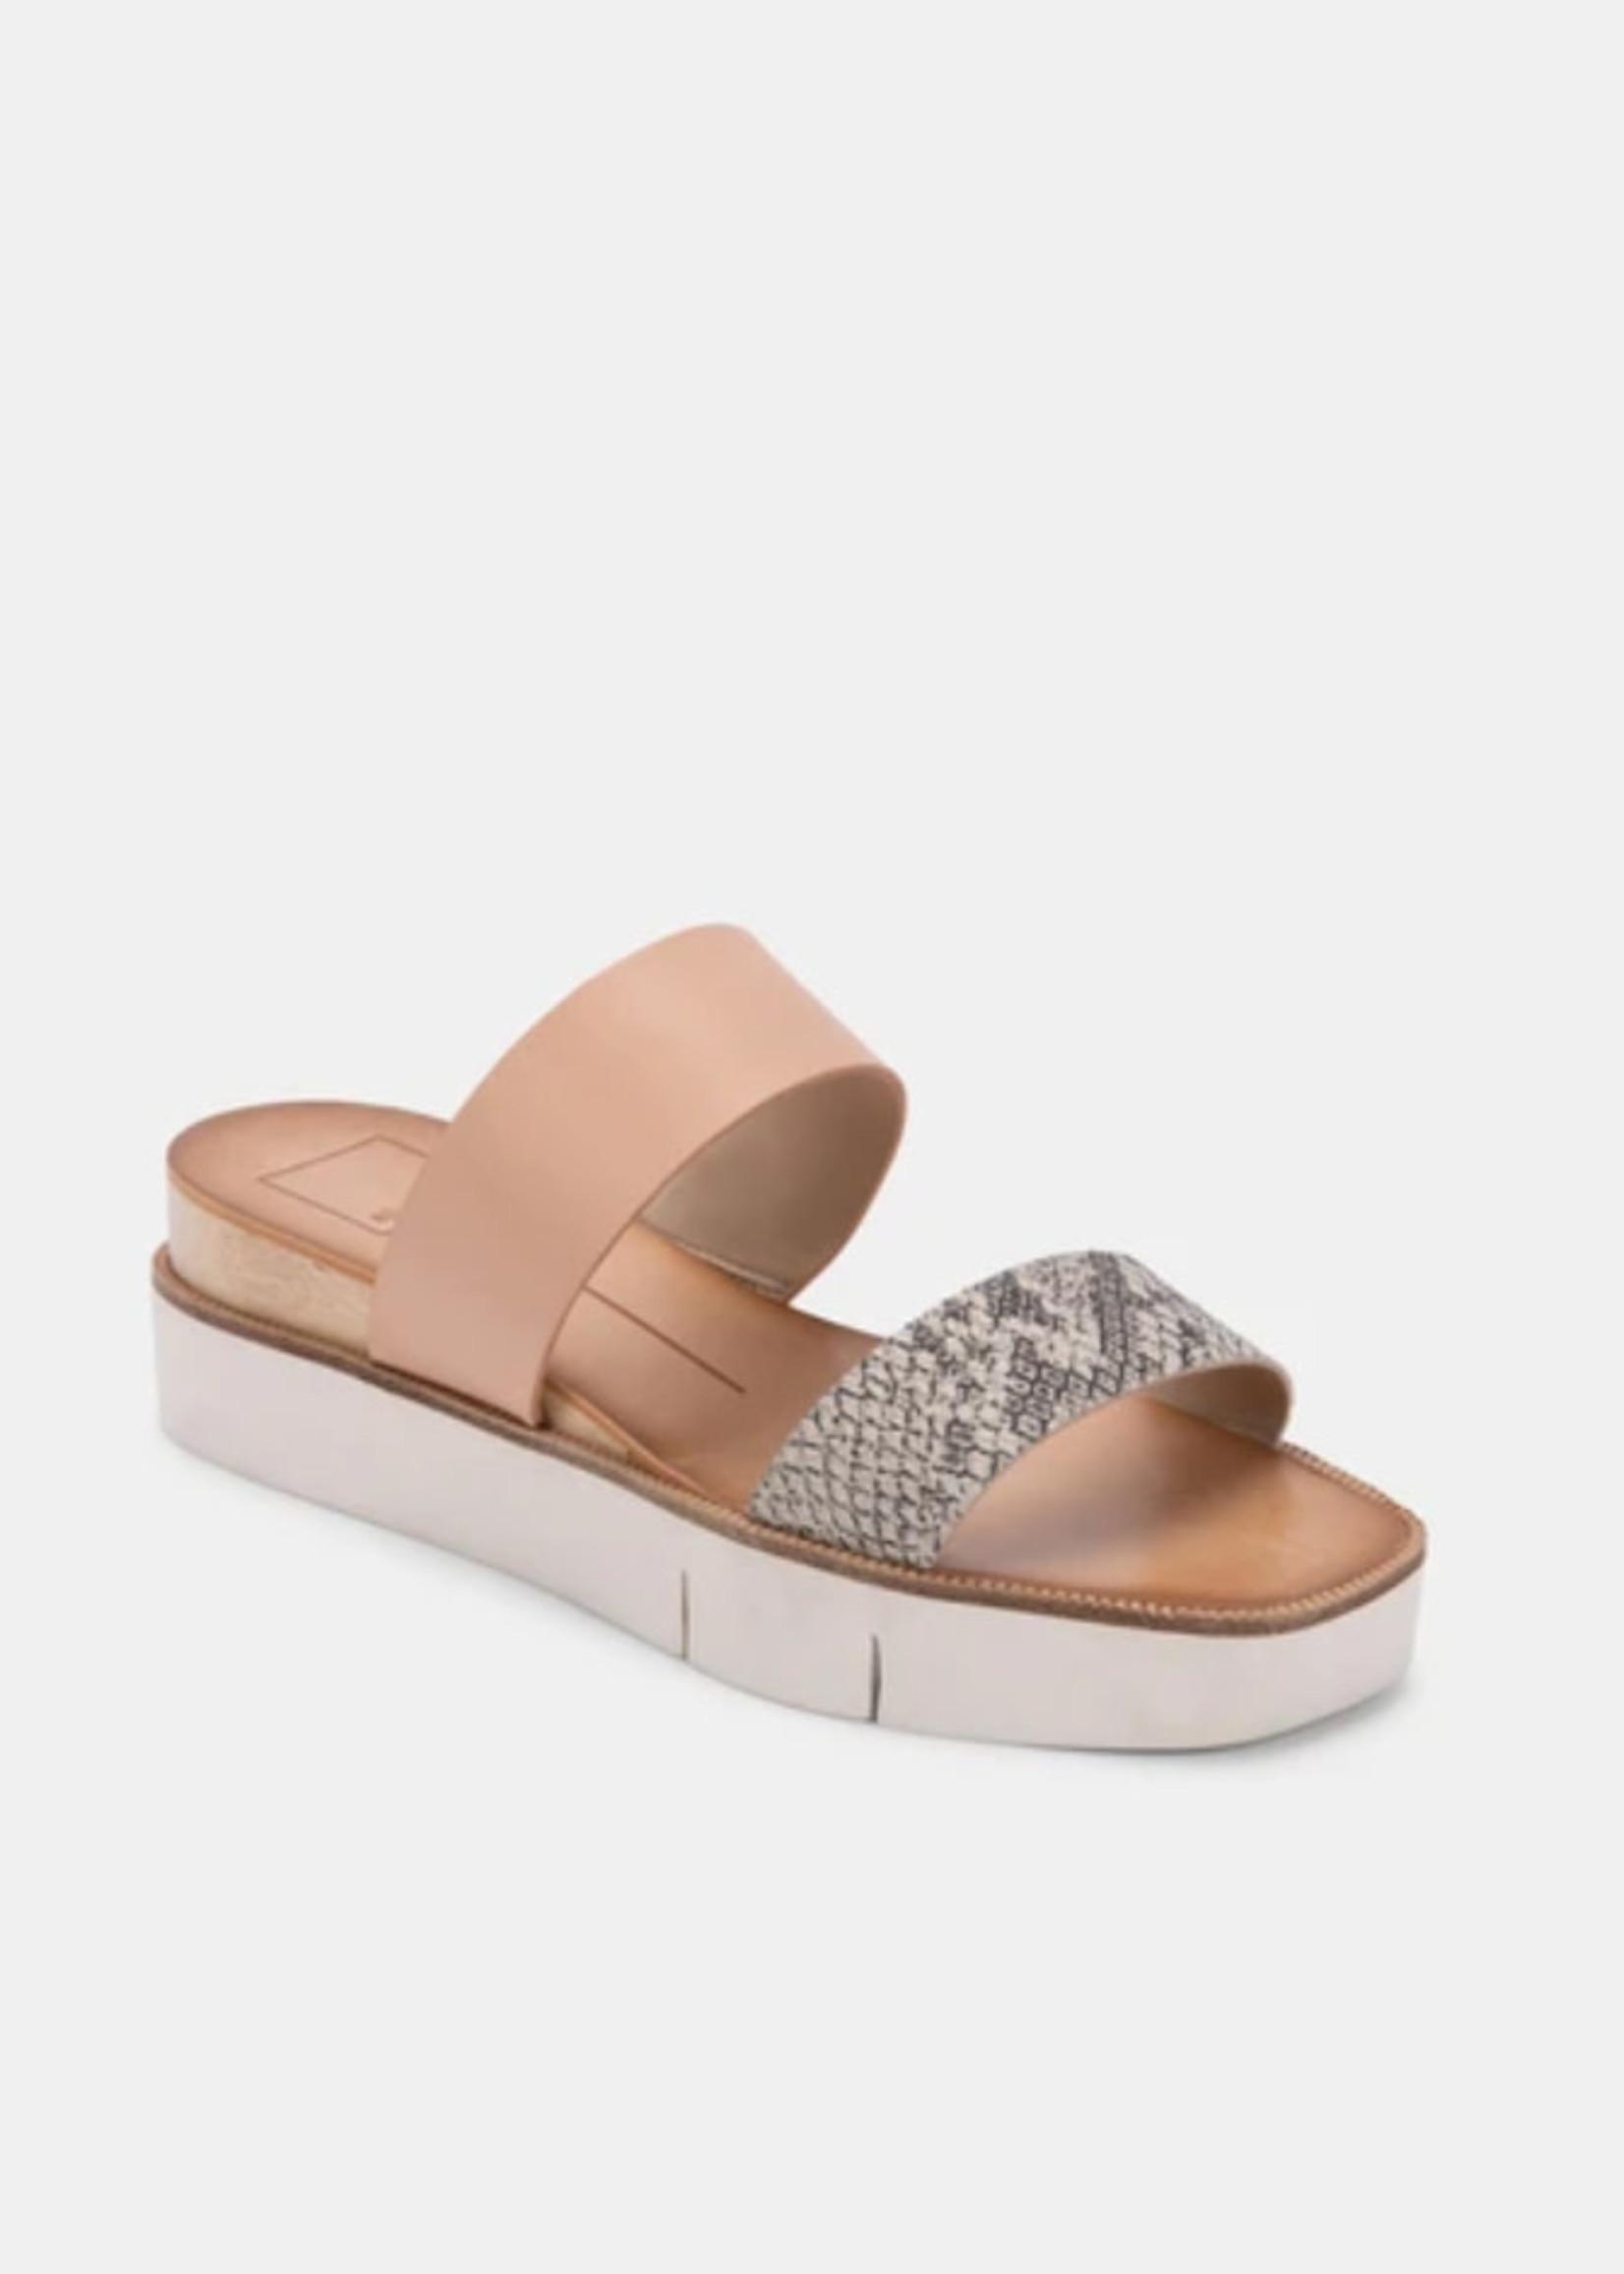 Parni Eva sandal